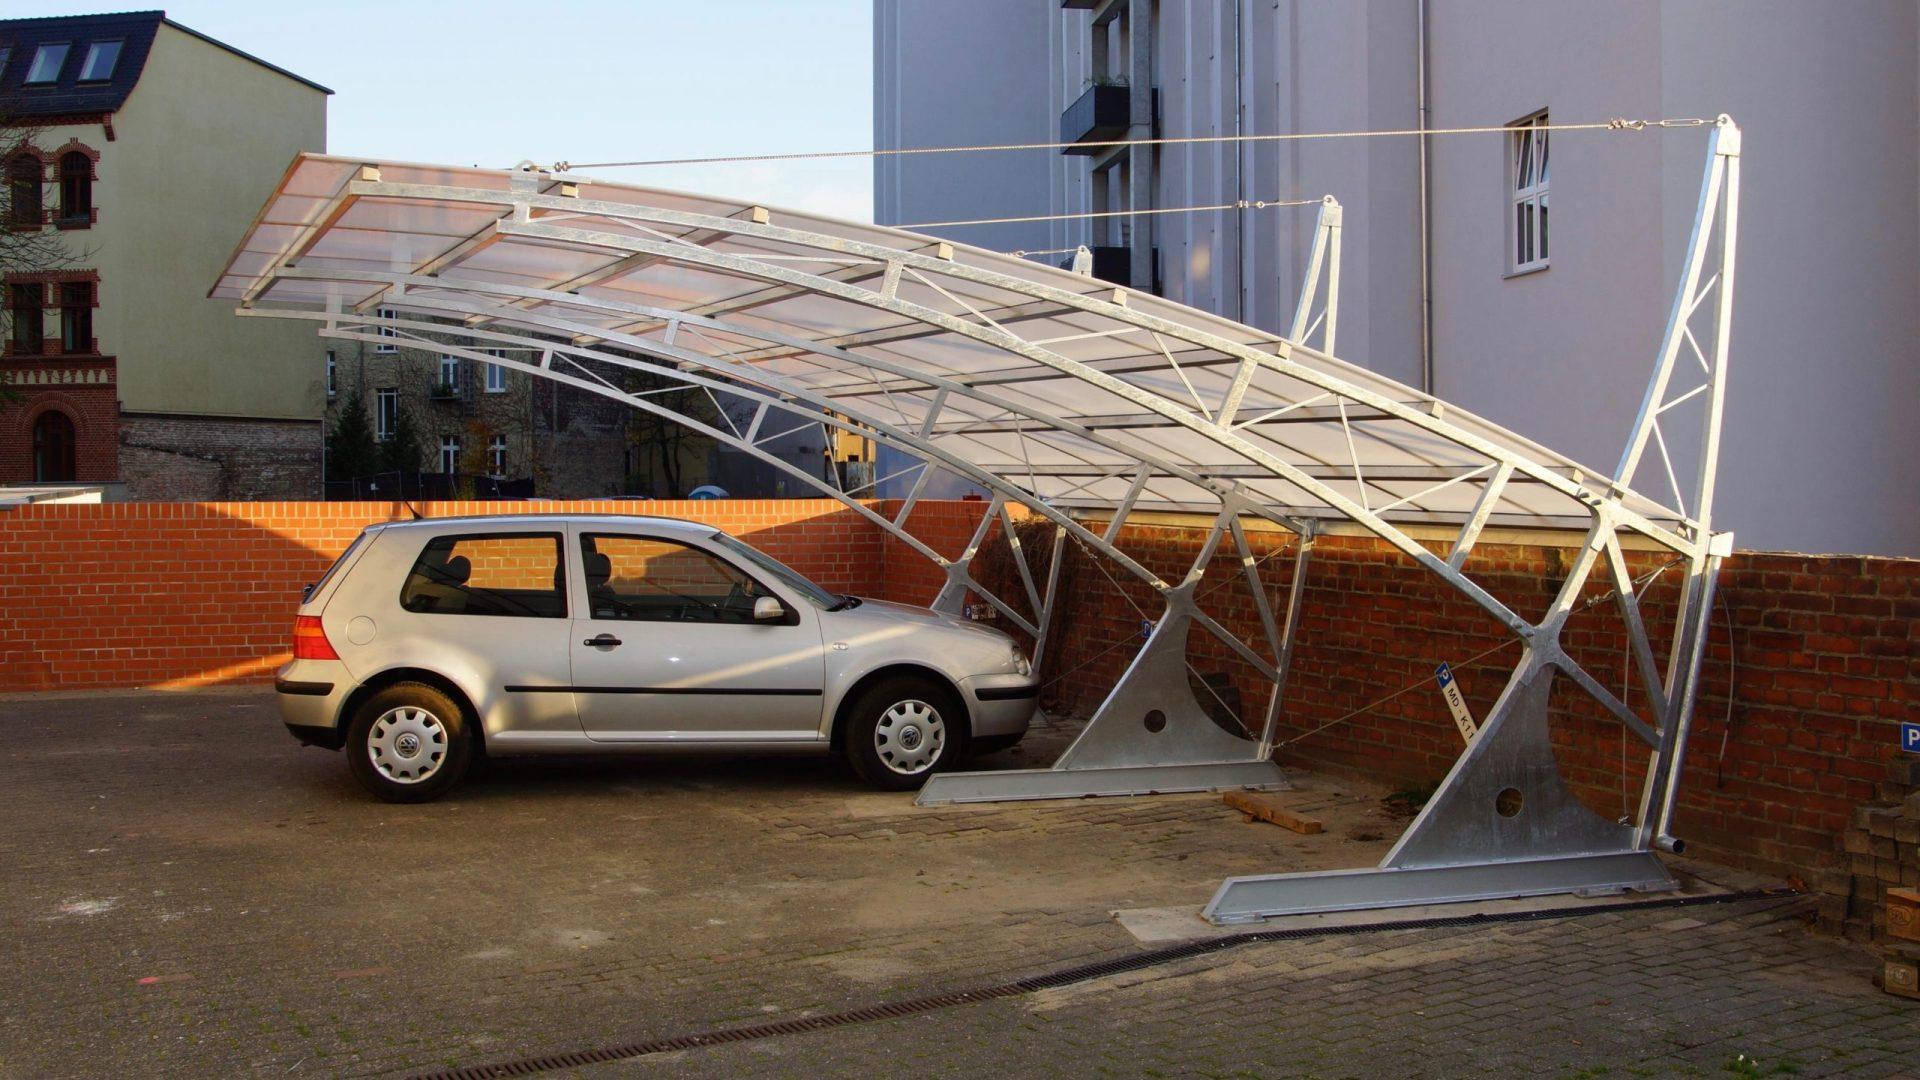 Bogendachcarport - Carportmaster Projekt 15-P-1025 - 39104 Magdeburg - Carportbild 01